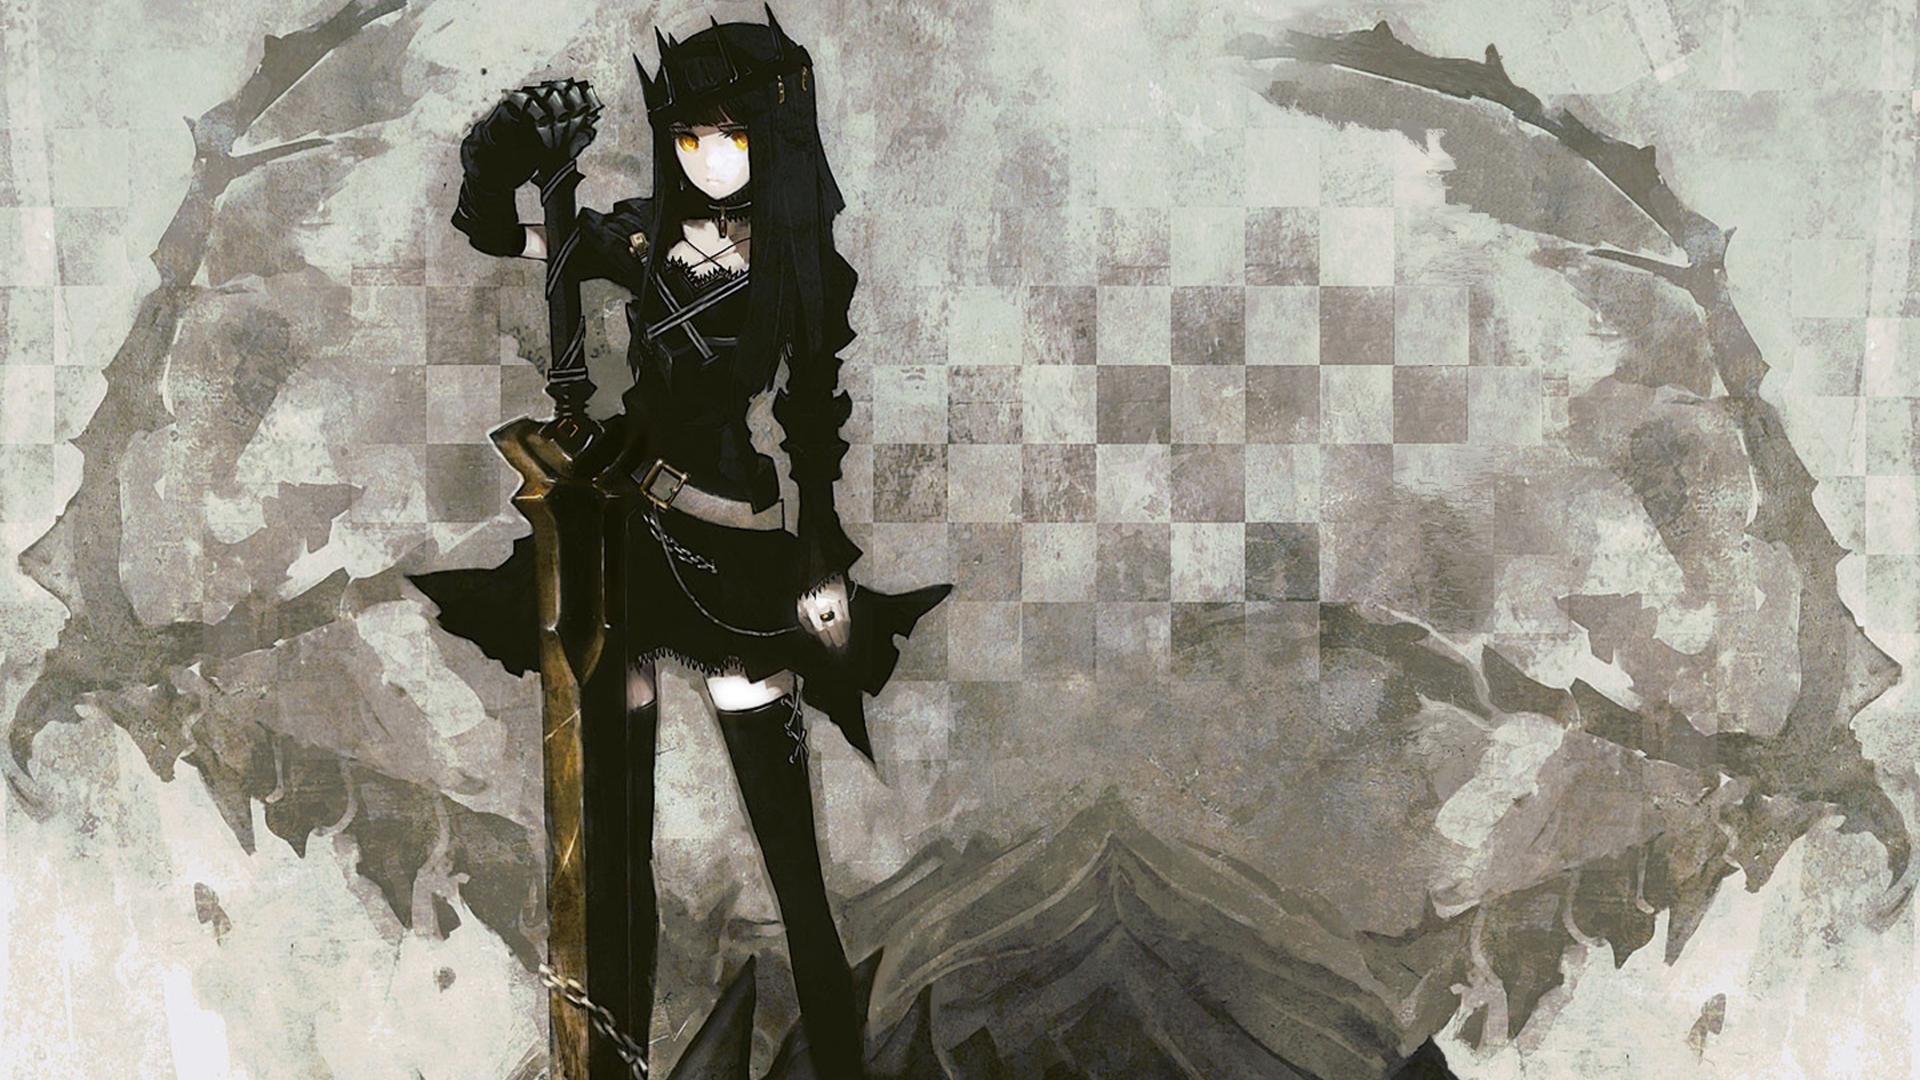 100 Wallpapers de anime HD Konachan-com-77816-black_rock_shooter-dragon_slayer-sword-weapon-yellow_eyes